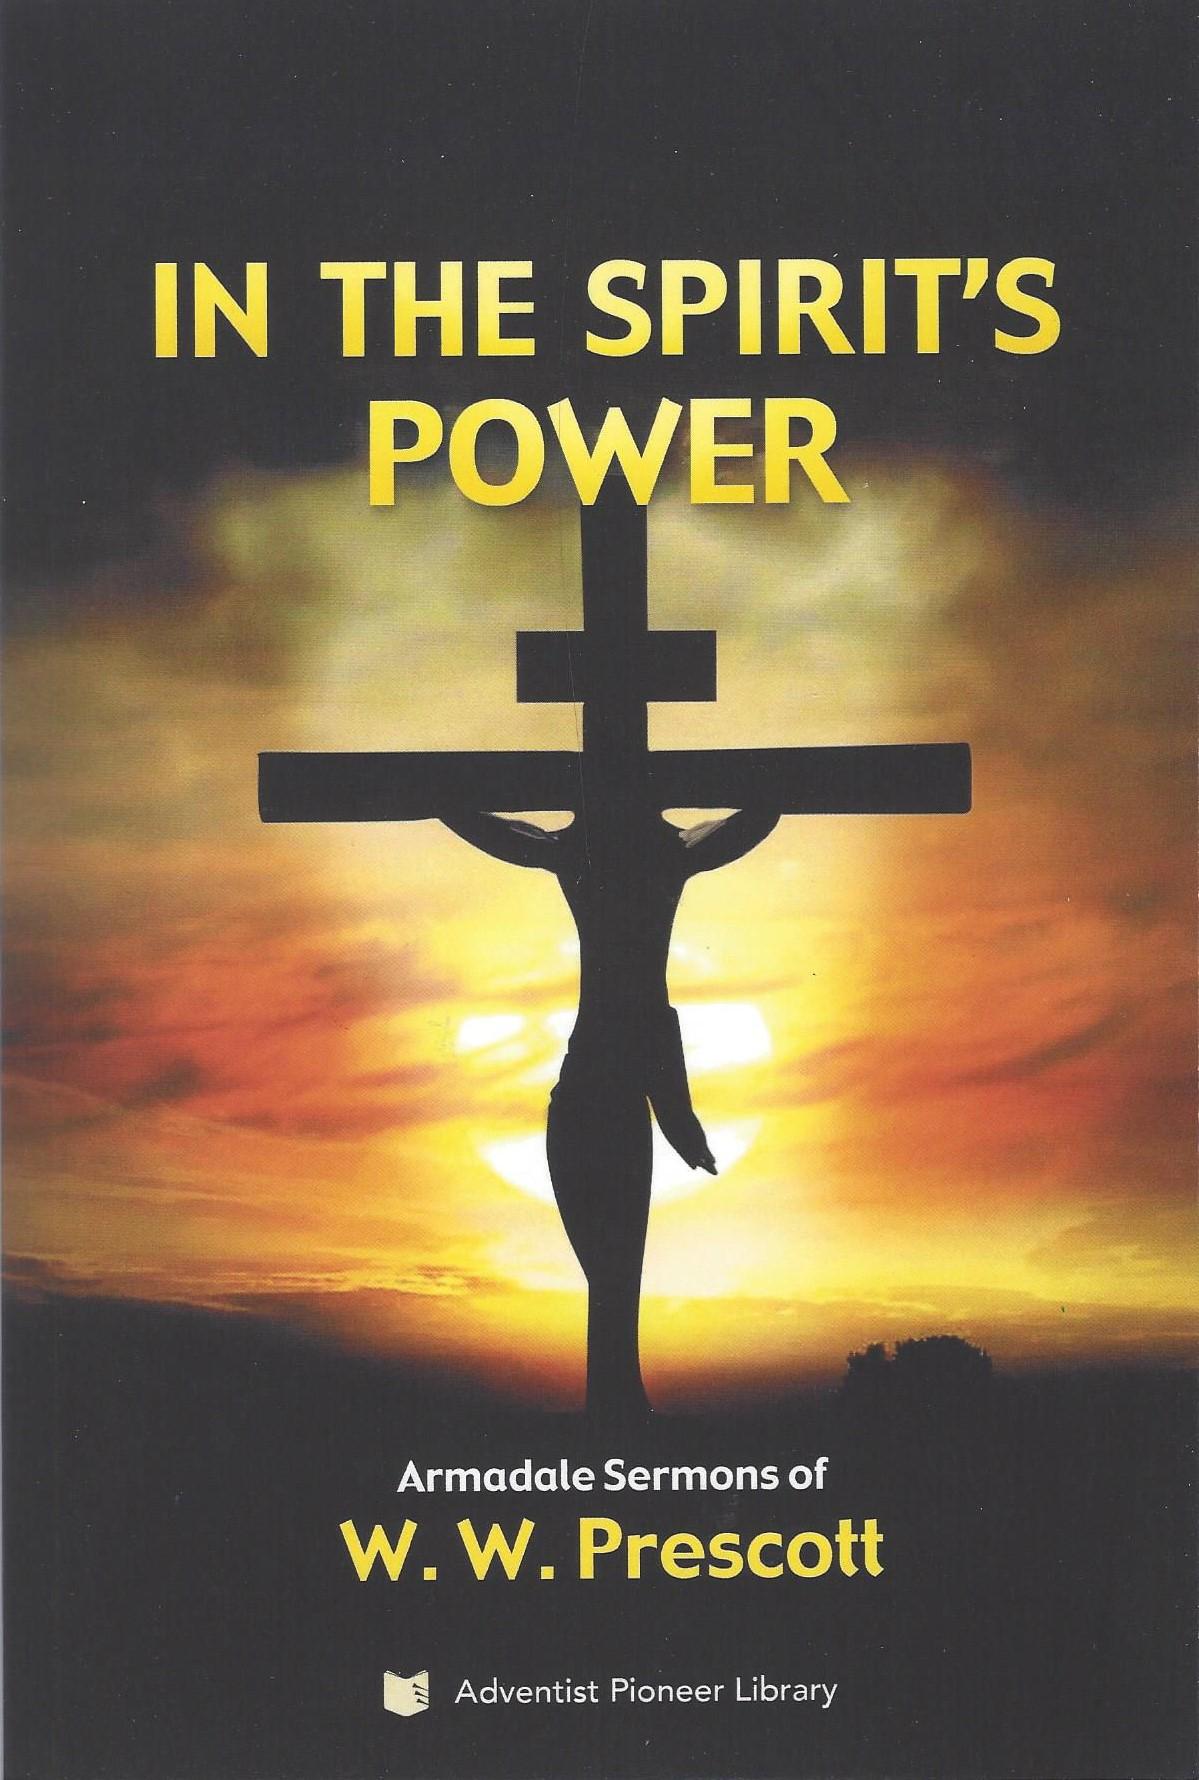 In The Spirit's Power